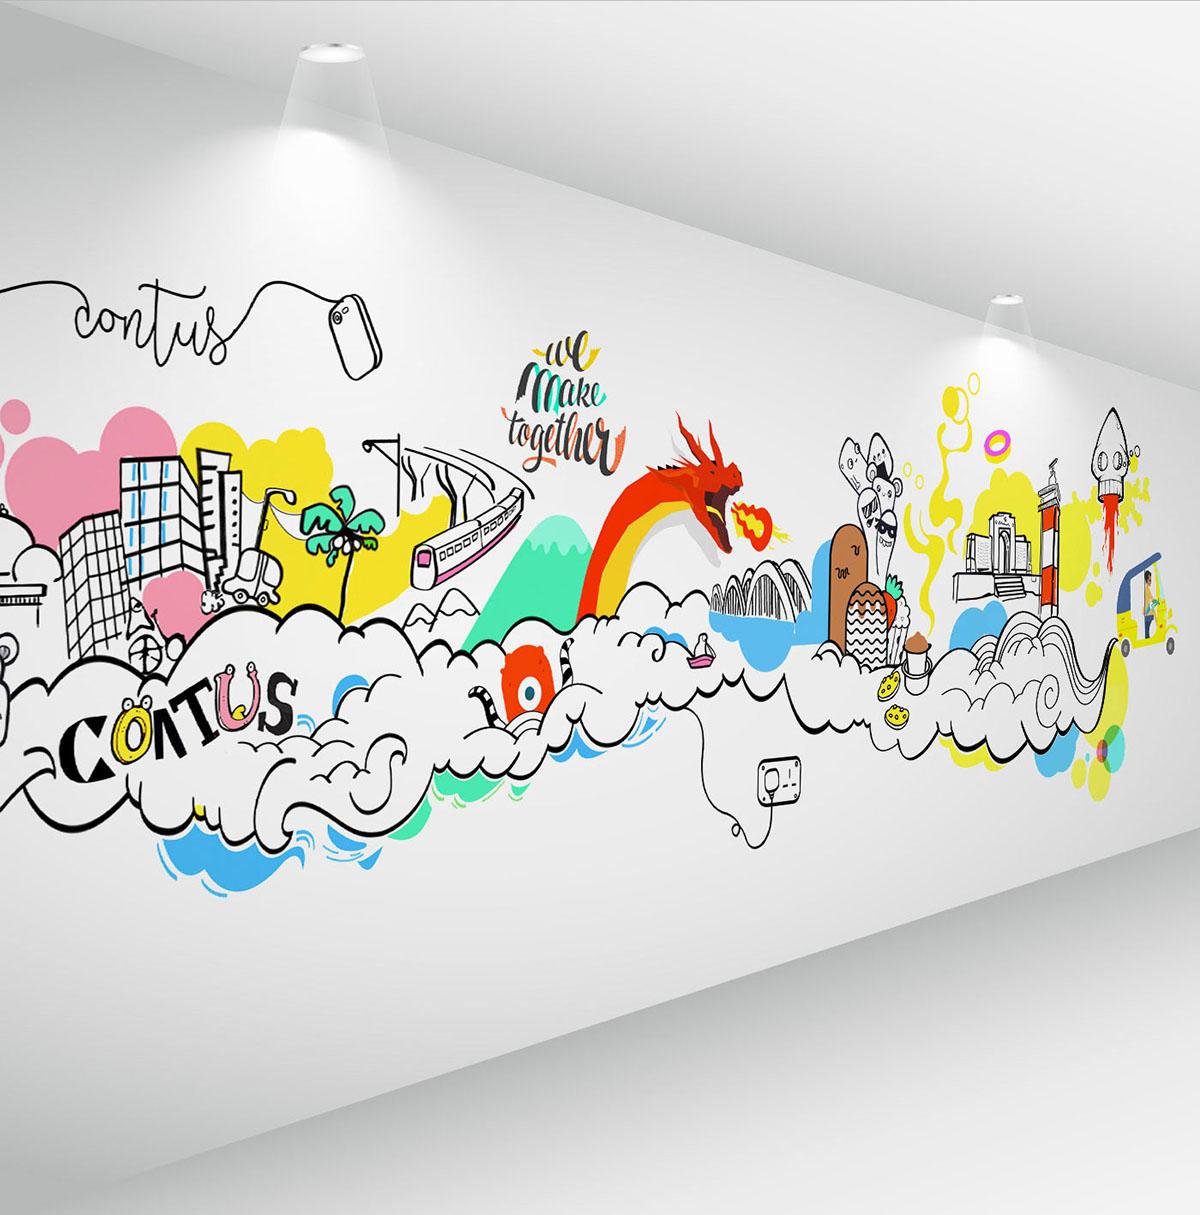 Workspace Office Wall Art, Chennai